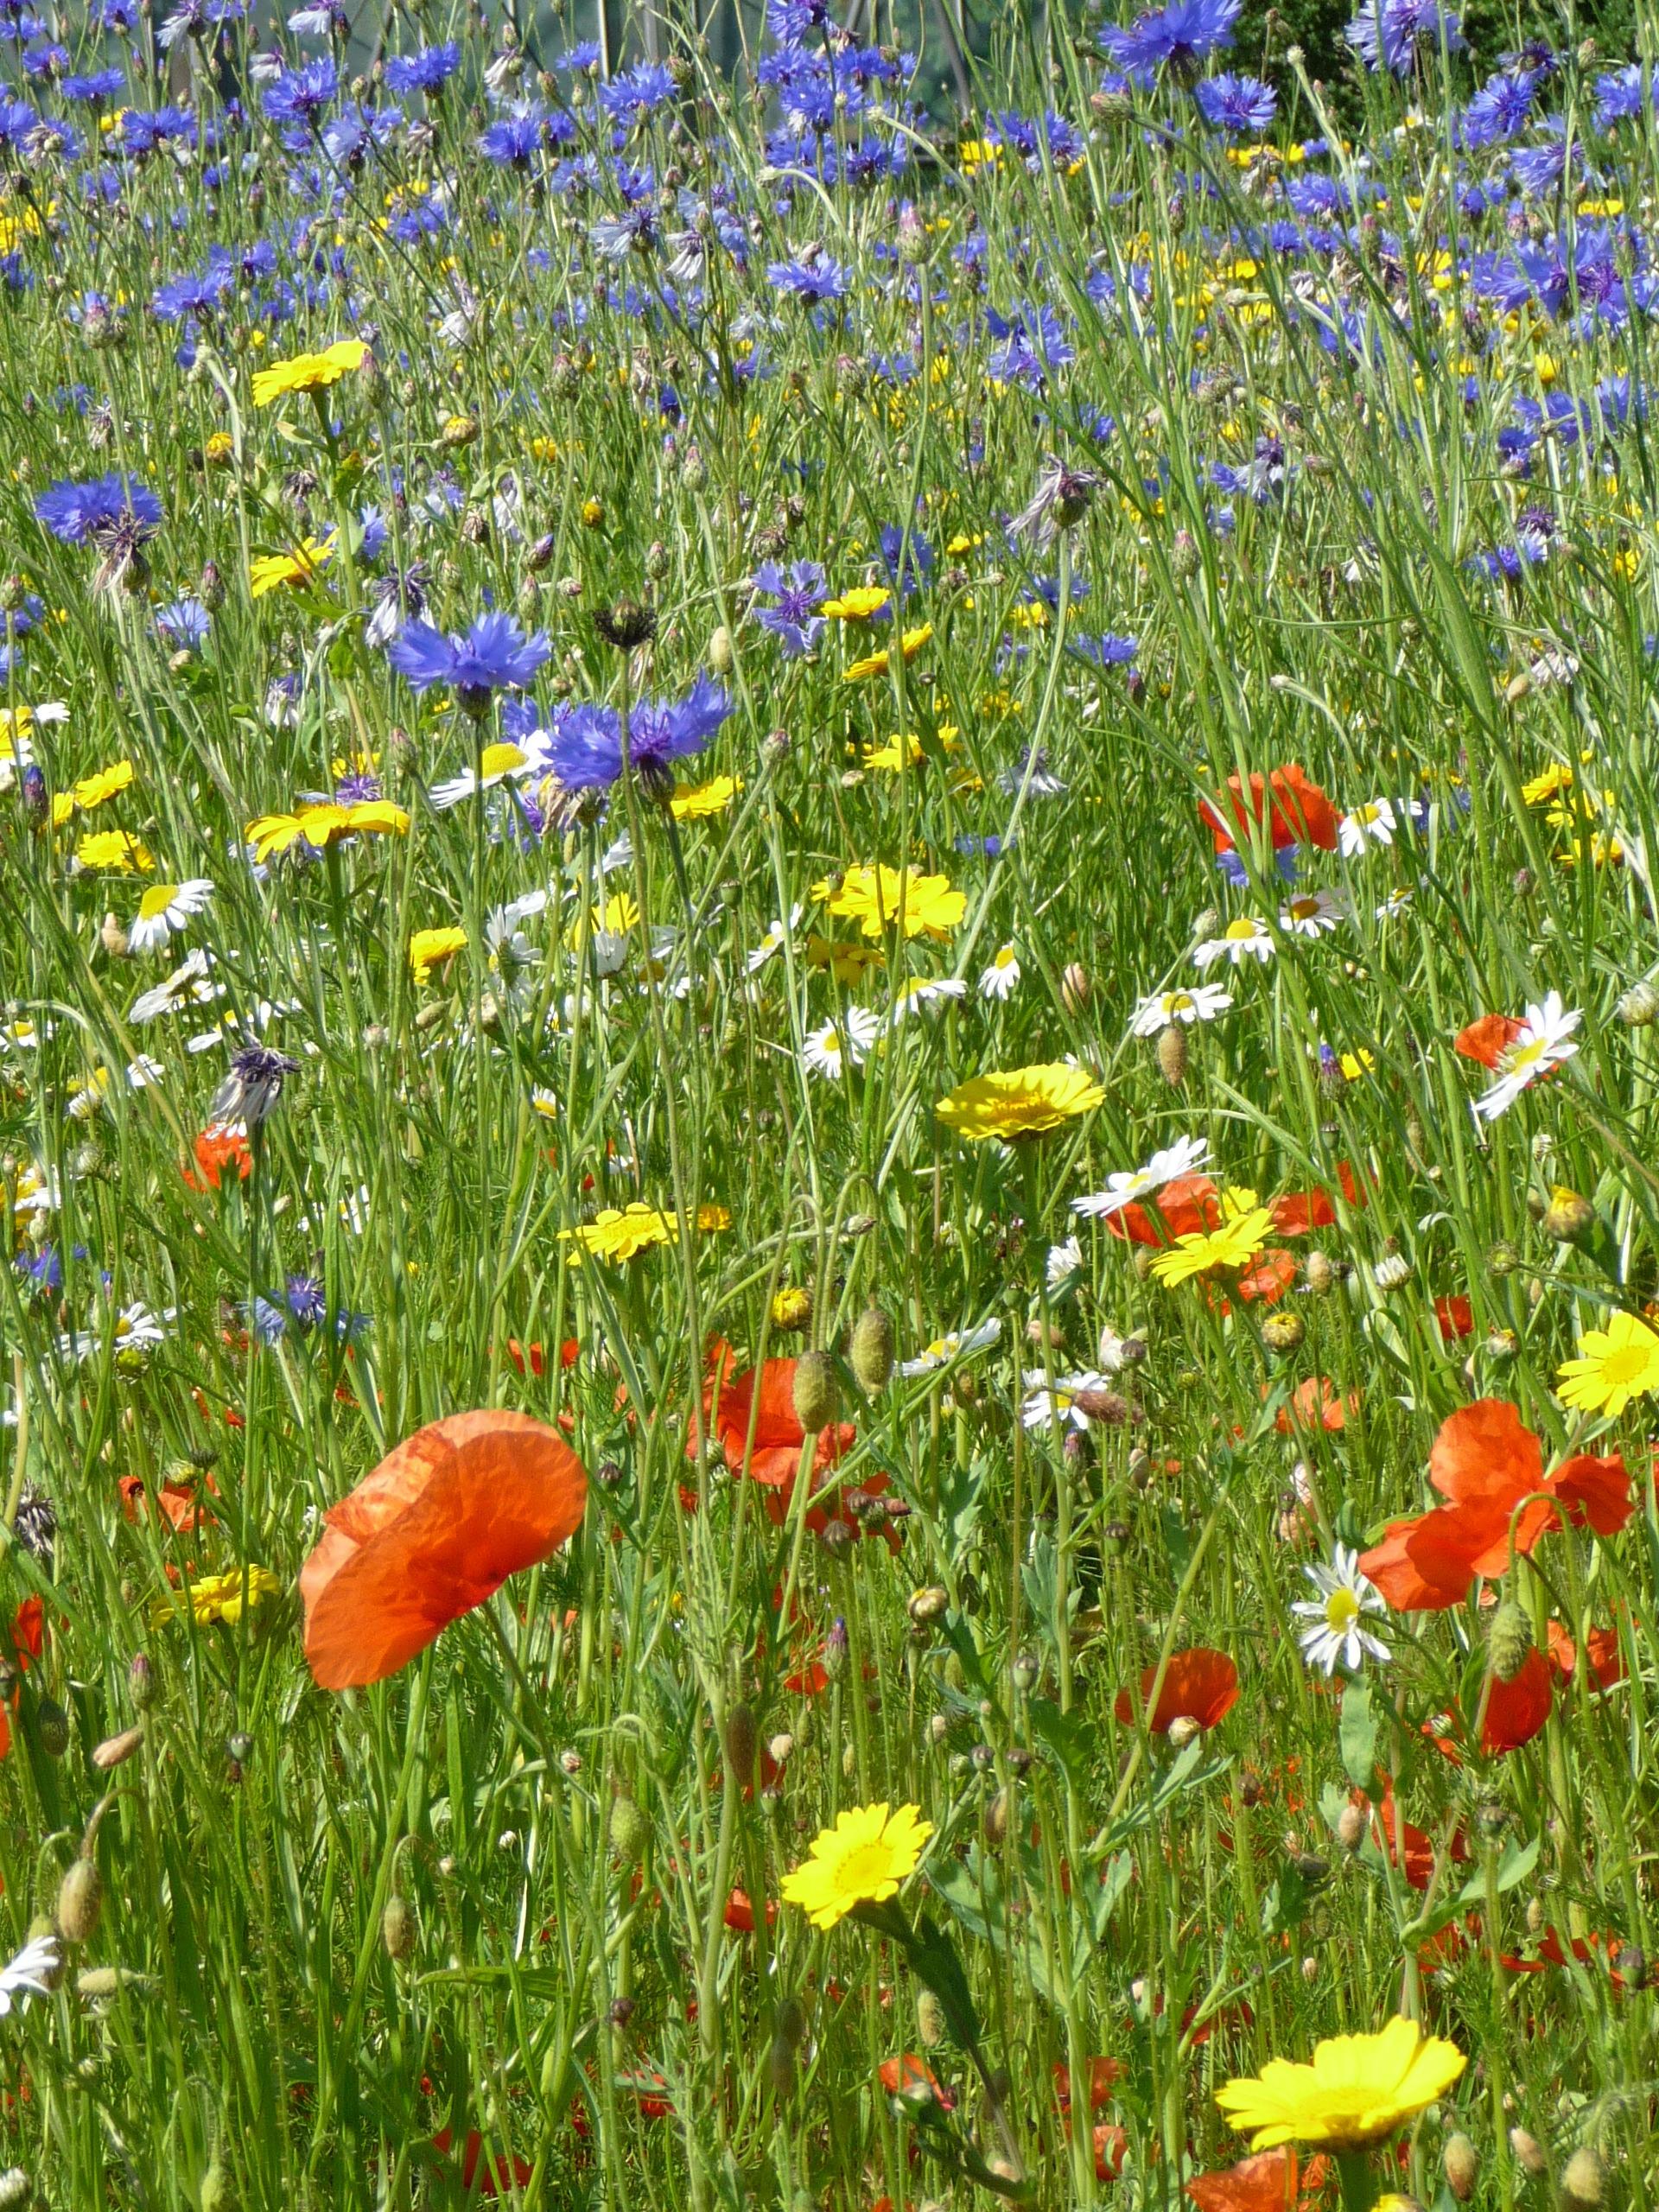 Flower meadow at the Botanics